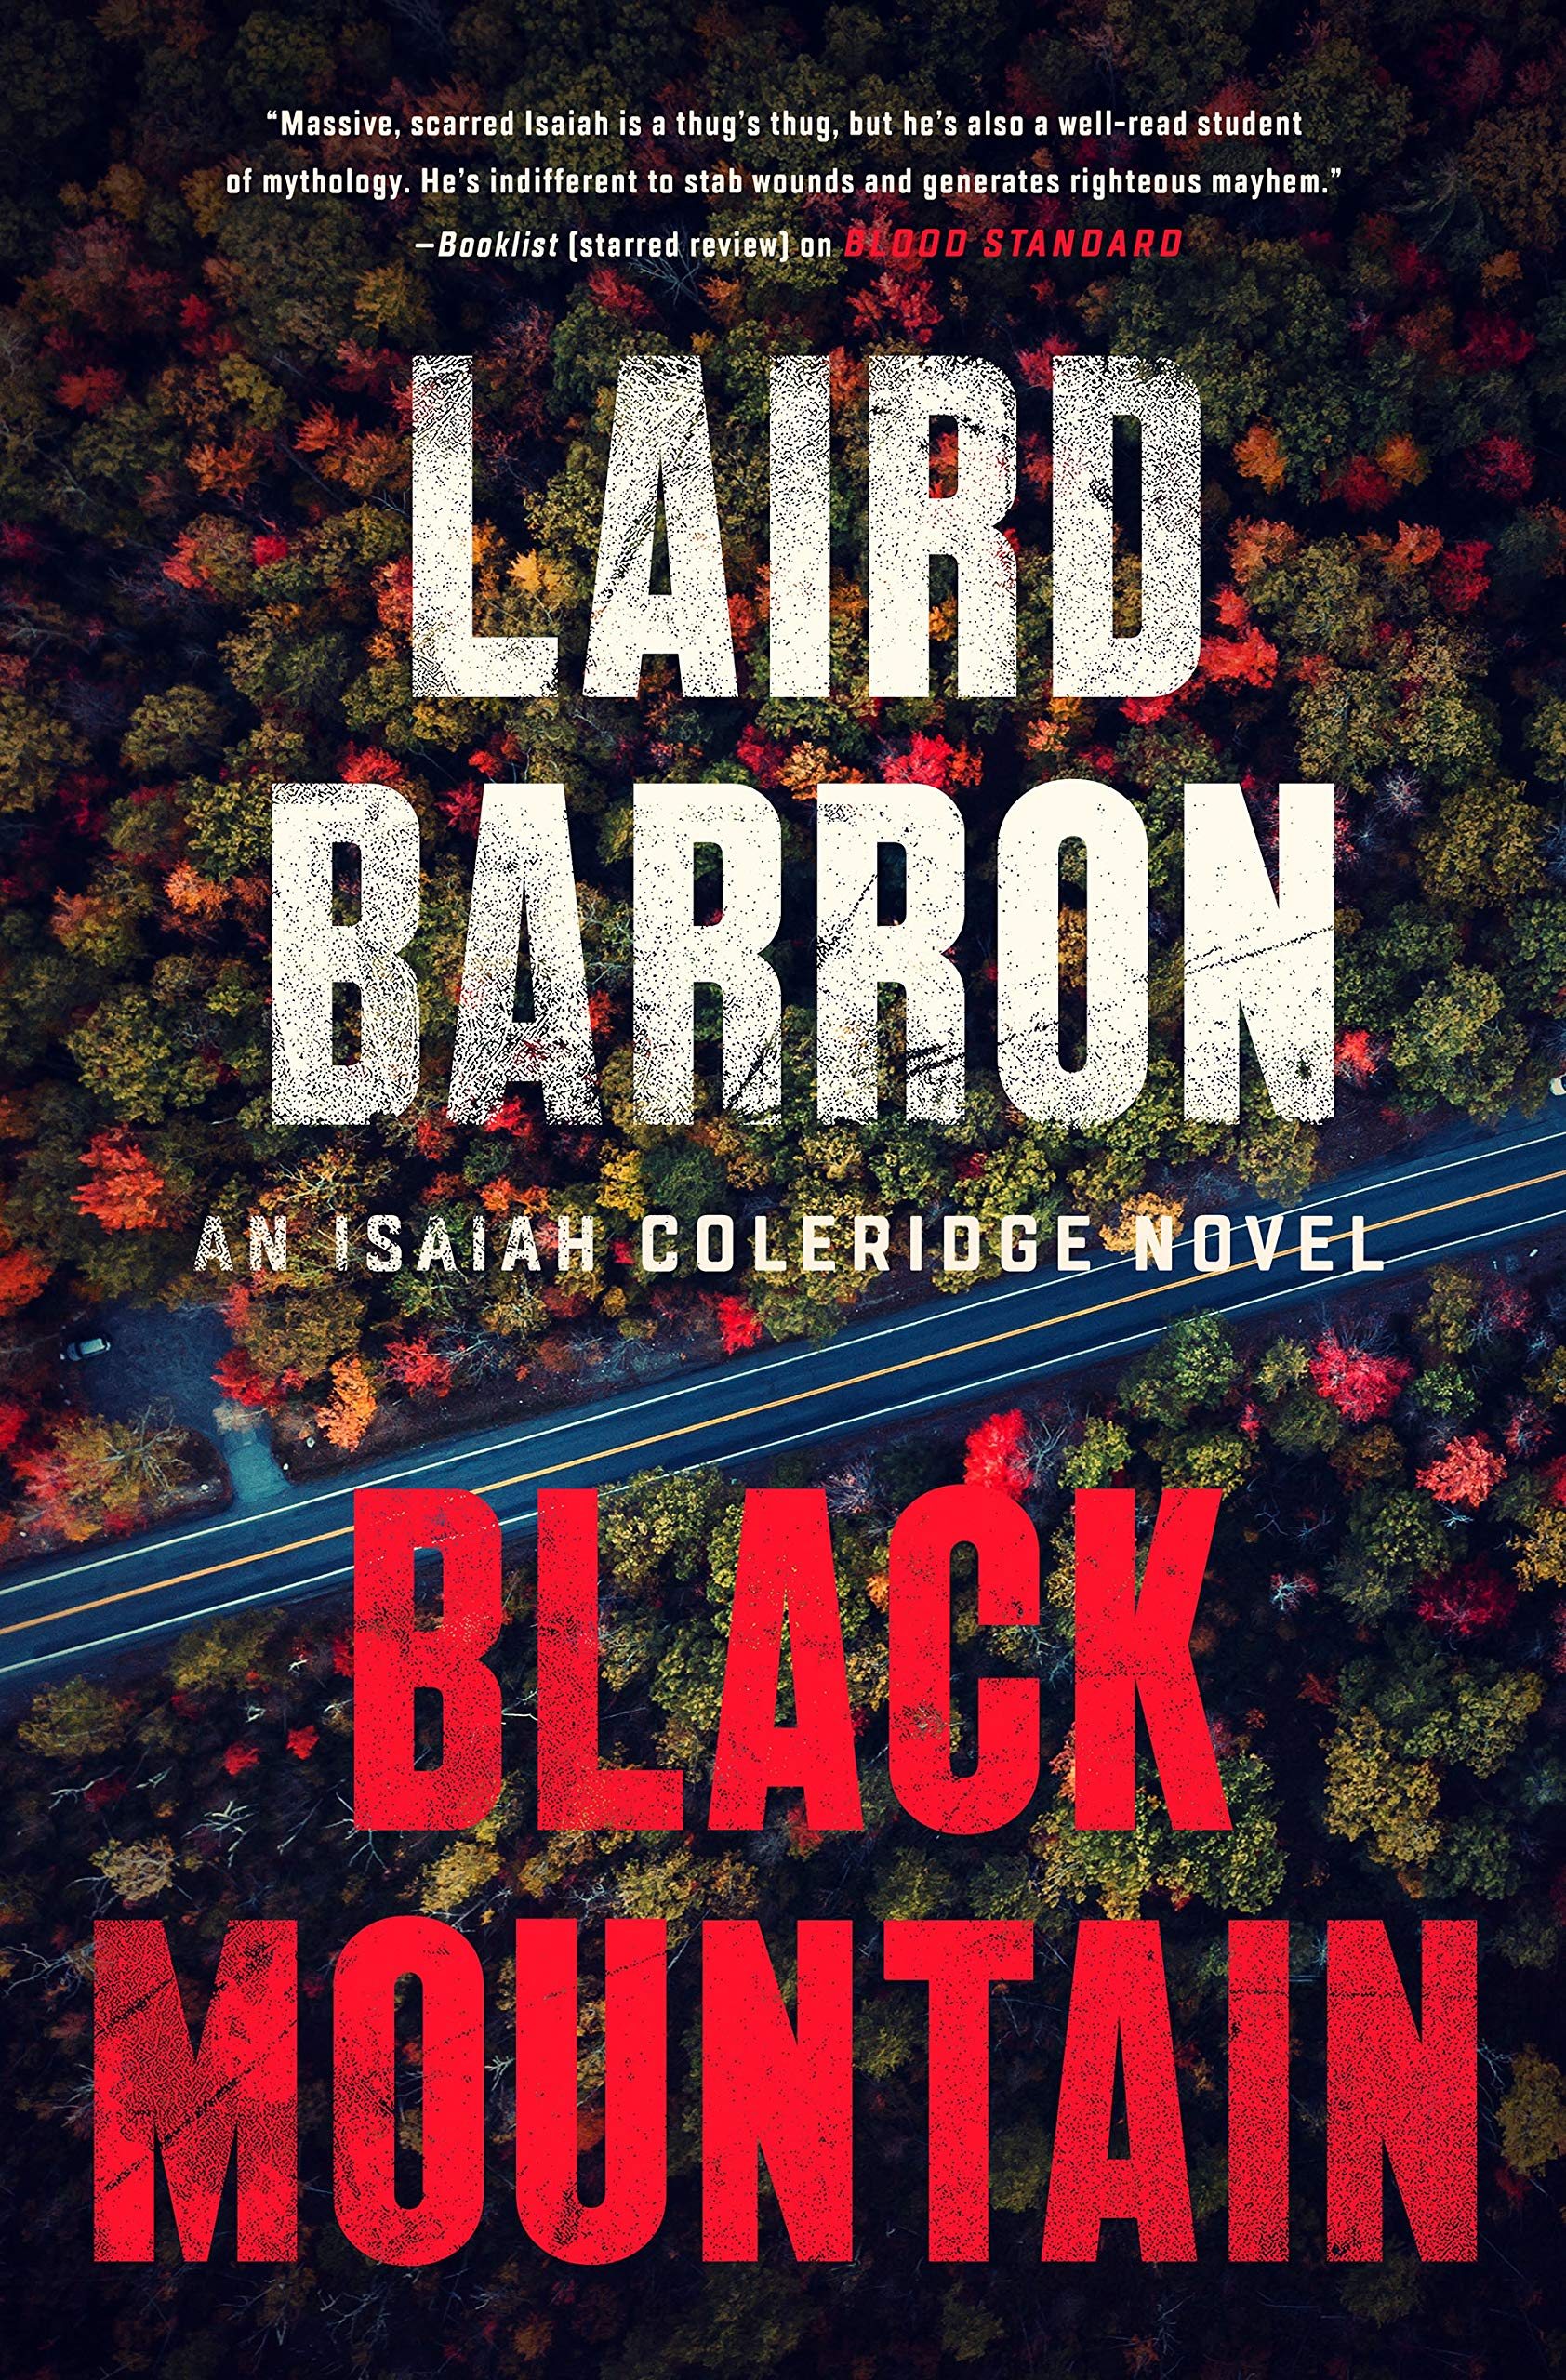 Black Mountain_Laird Barron.jpg